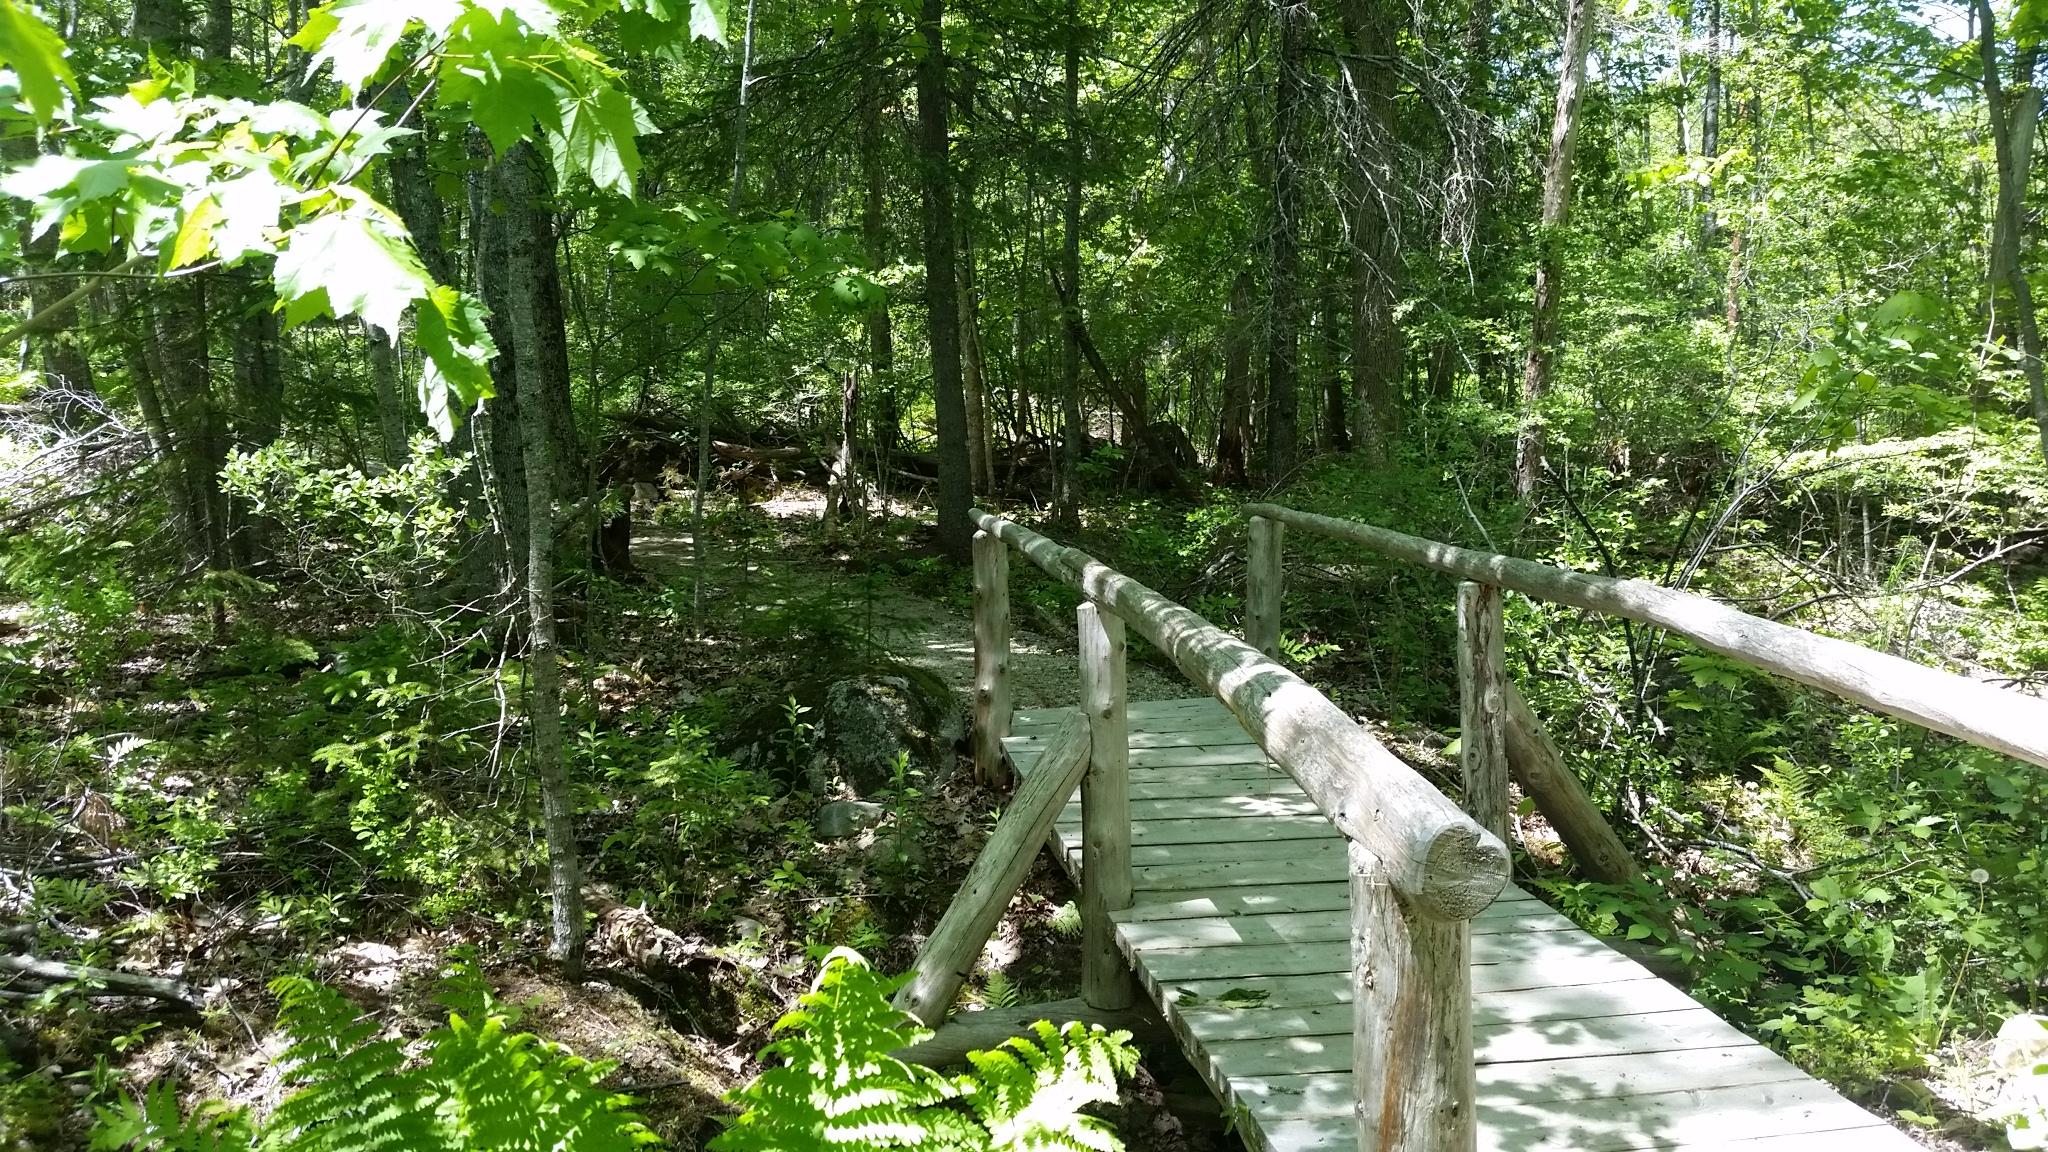 Town-of-Blue-Hill-walking-trail-BHHT.jpg